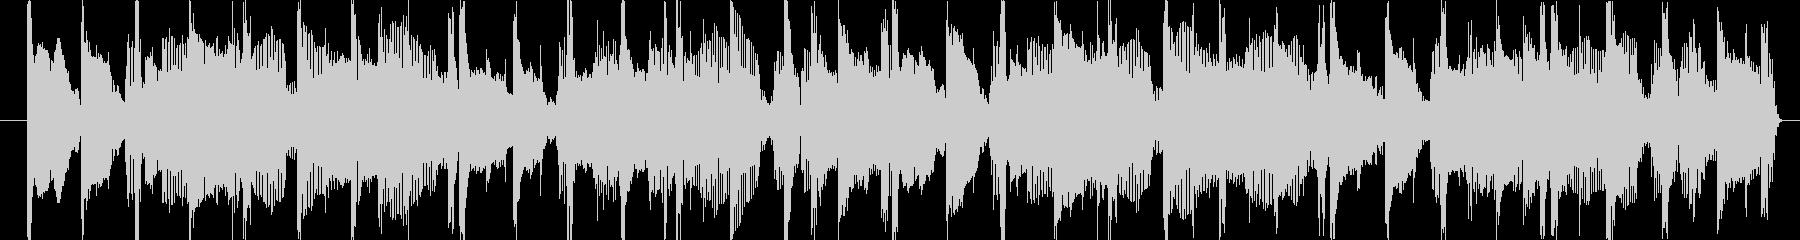 90sR&B風ジングルの未再生の波形